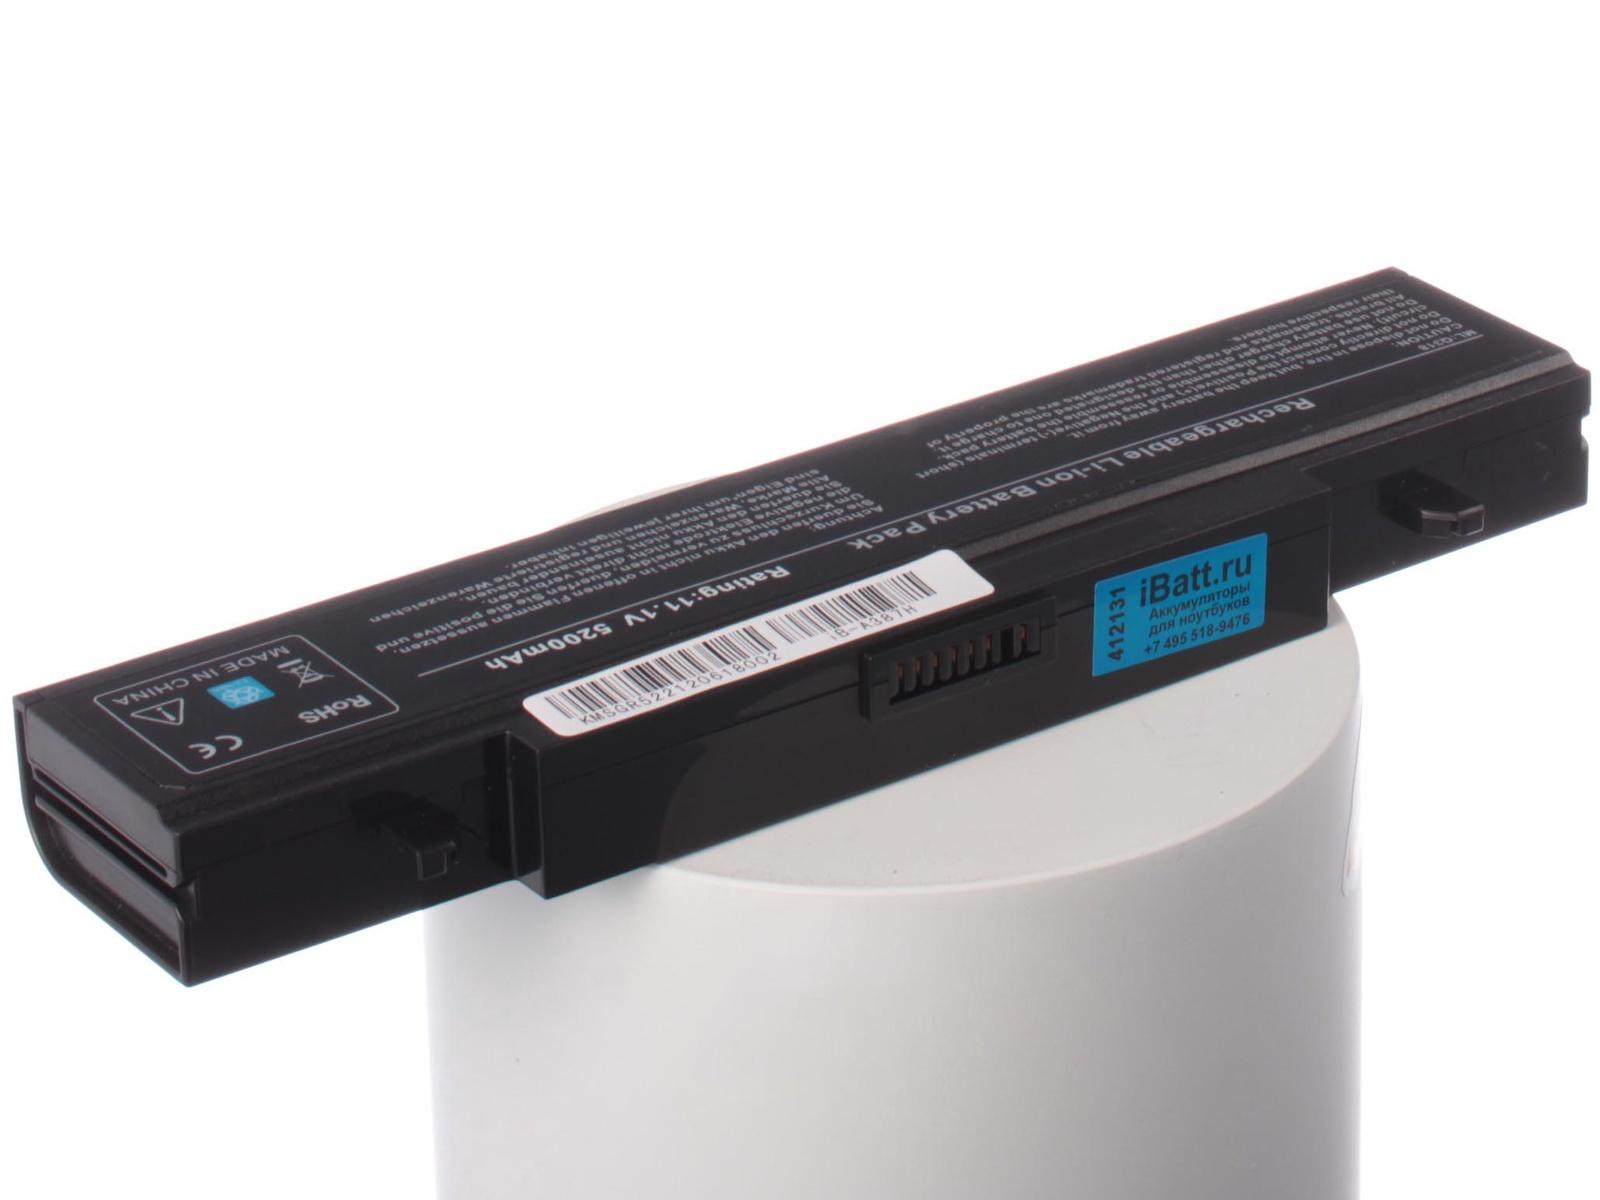 Аккумулятор для ноутбука iBatt для Samsung RC510-S03, RC720-S01, RV515-S01, RV515-S07, RV520-A01, 270E5E-X06, 300V4A-A04, 300V5A-S0W, 305V5A-A01, 350V5C-S1F, 550P5C-S01, R425-JS02, R528-DA01, R730-JB02, RC510-S05, RF510-S02 аккумулятор для ноутбука ibatt для samsung rc510 s03 rc720 s01 rv515 s01 rv515 s07 rv520 a01 270e5e x06 300v4a a04 300v5a s0w 305v5a a01 350v5c s1f 550p5c s01 r425 js02 r528 da01 r730 jb02 rc510 s05 rf510 s02